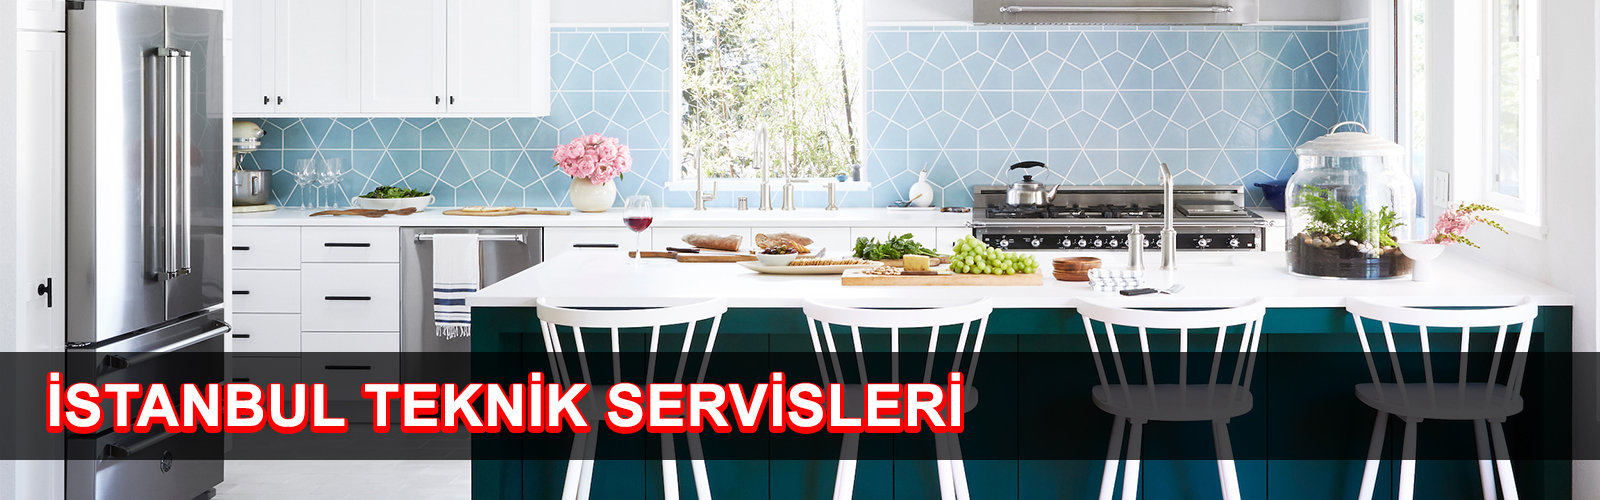 istanbul teknik servisleri